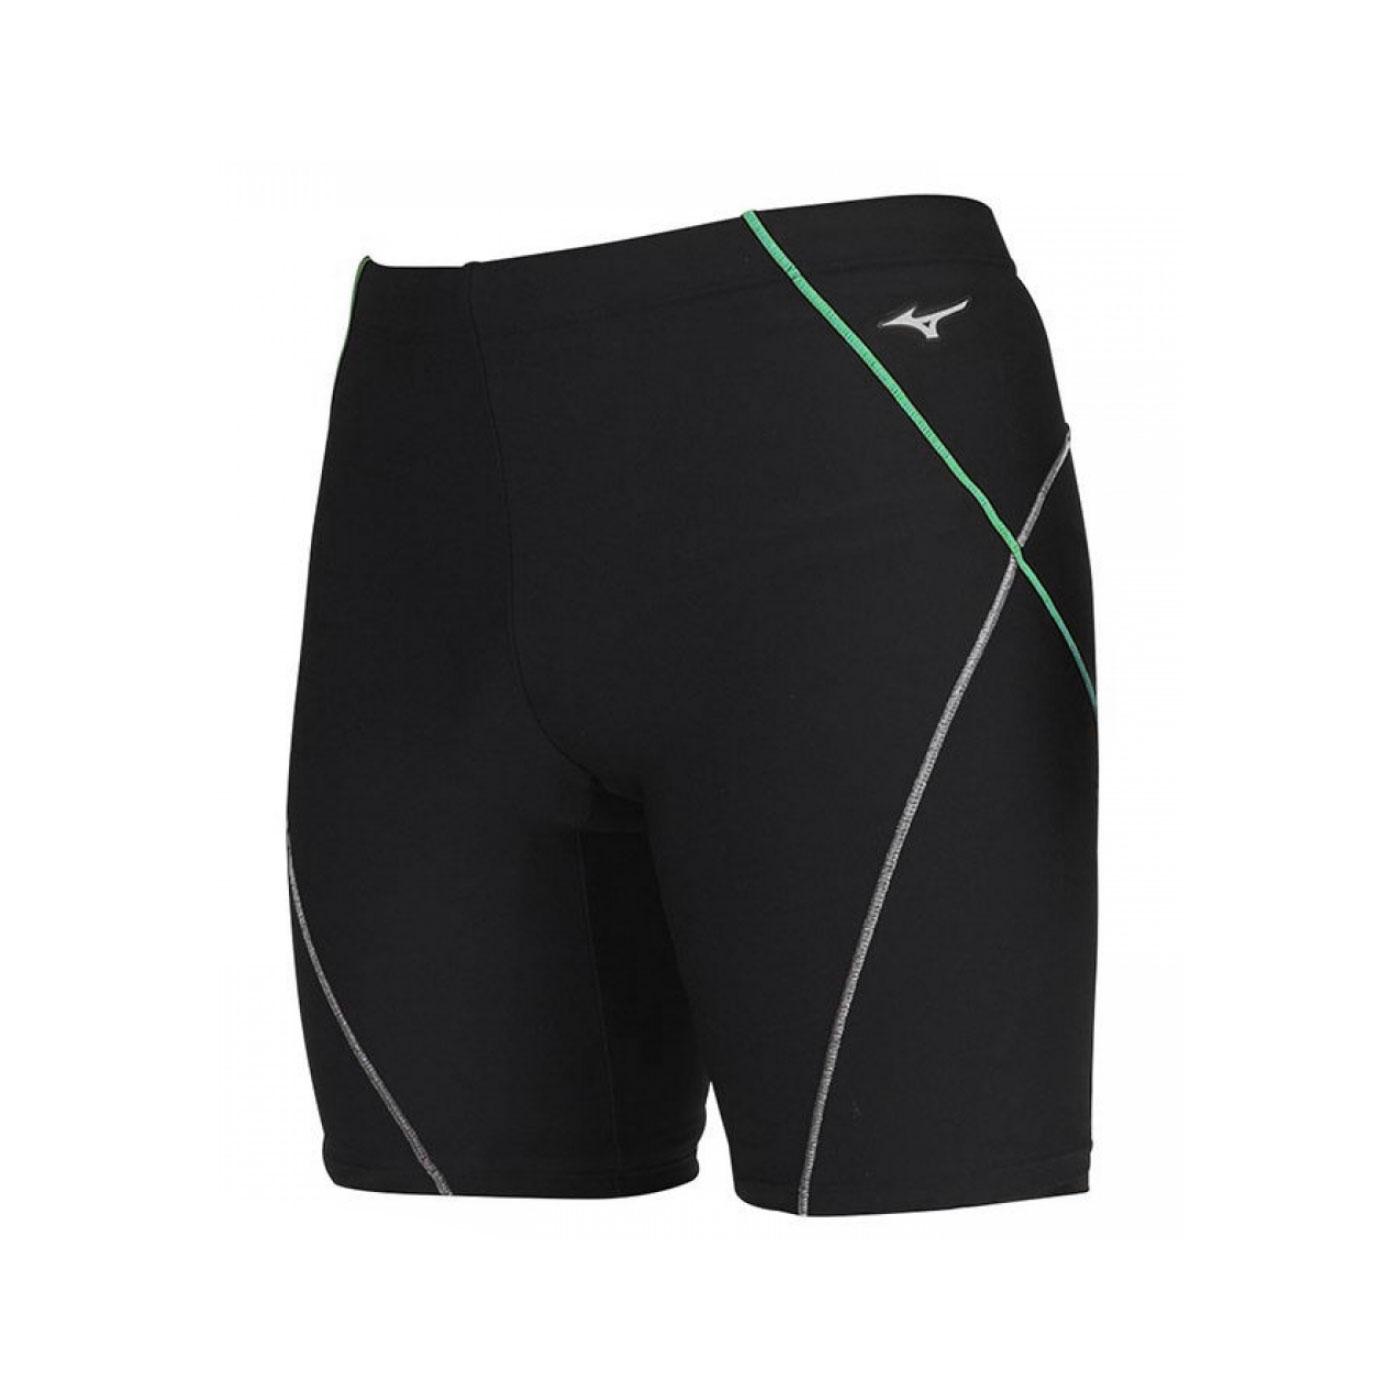 MIZUNO 男款FITNESS五分泳褲  SWIMN2JB011593 - 黑綠白